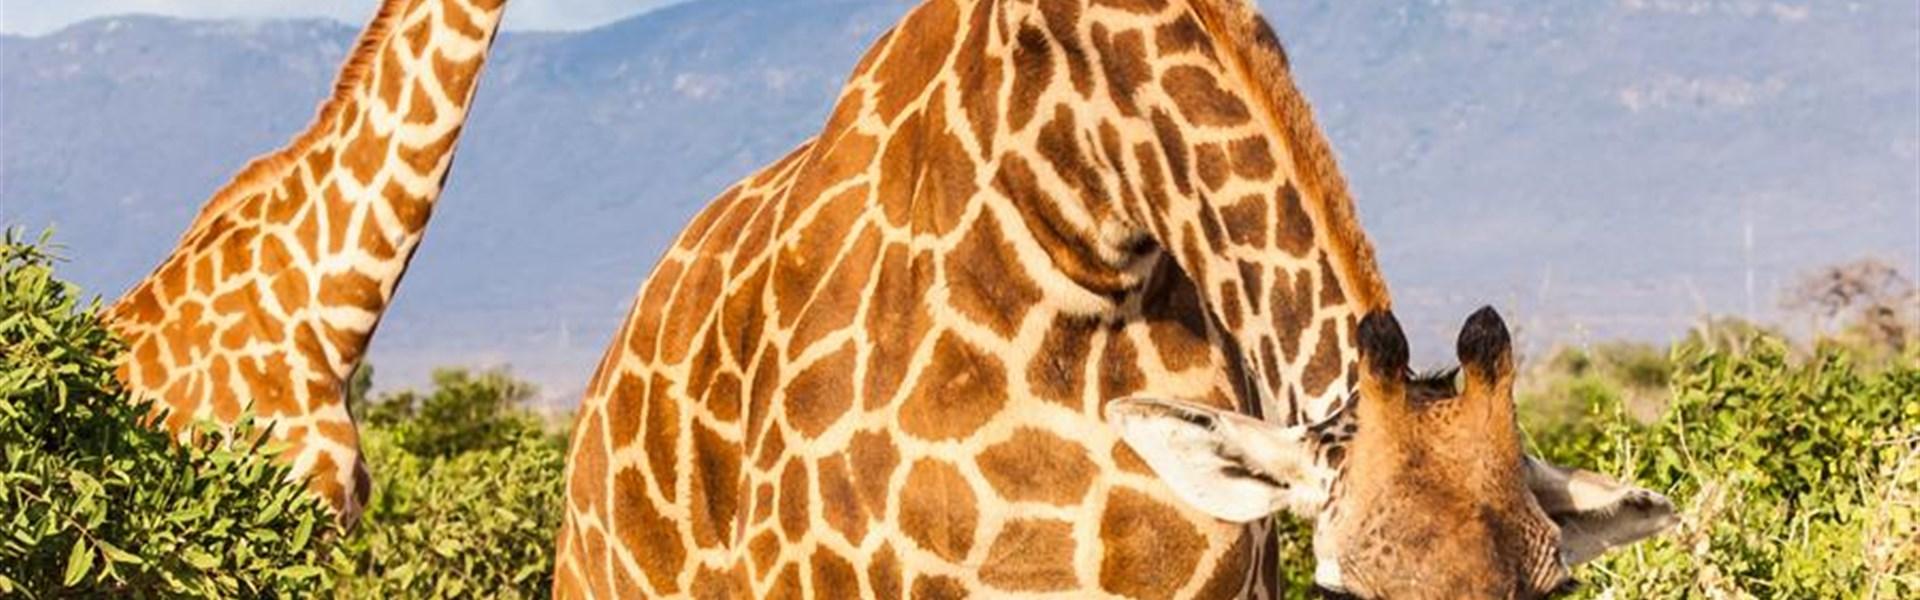 Léto u moře v Keni + 2 noci na safari -